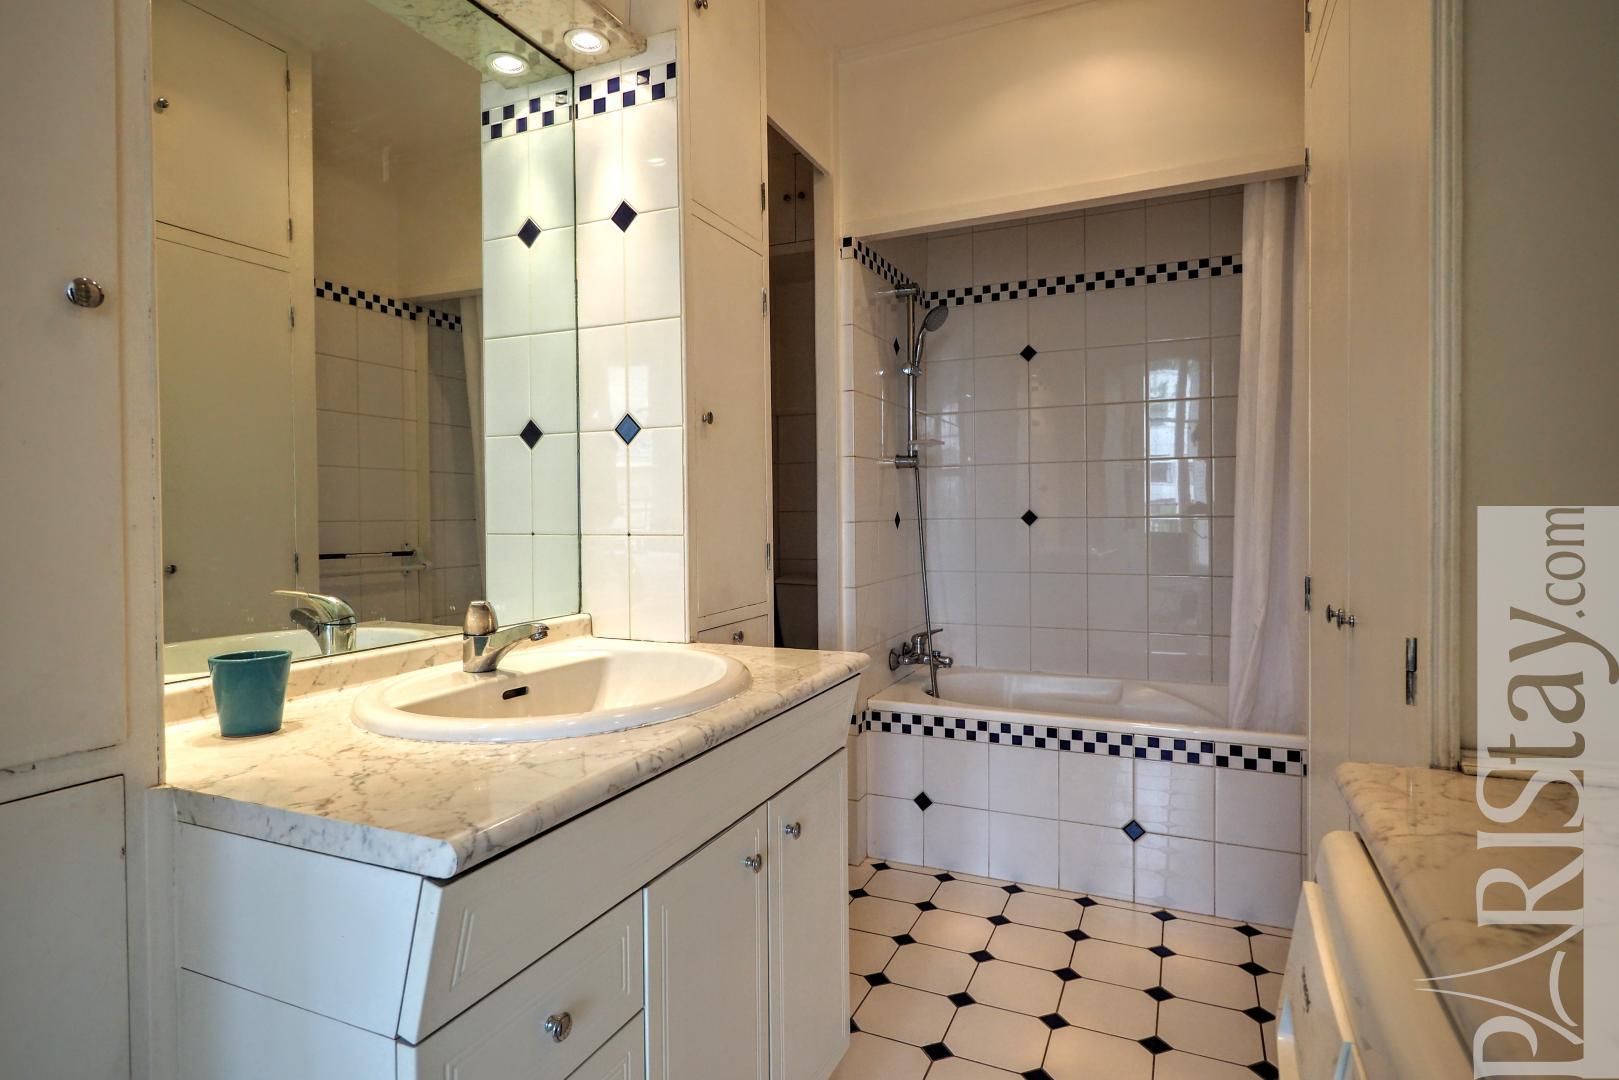 paris location meubl e appartement type t2 varenne. Black Bedroom Furniture Sets. Home Design Ideas